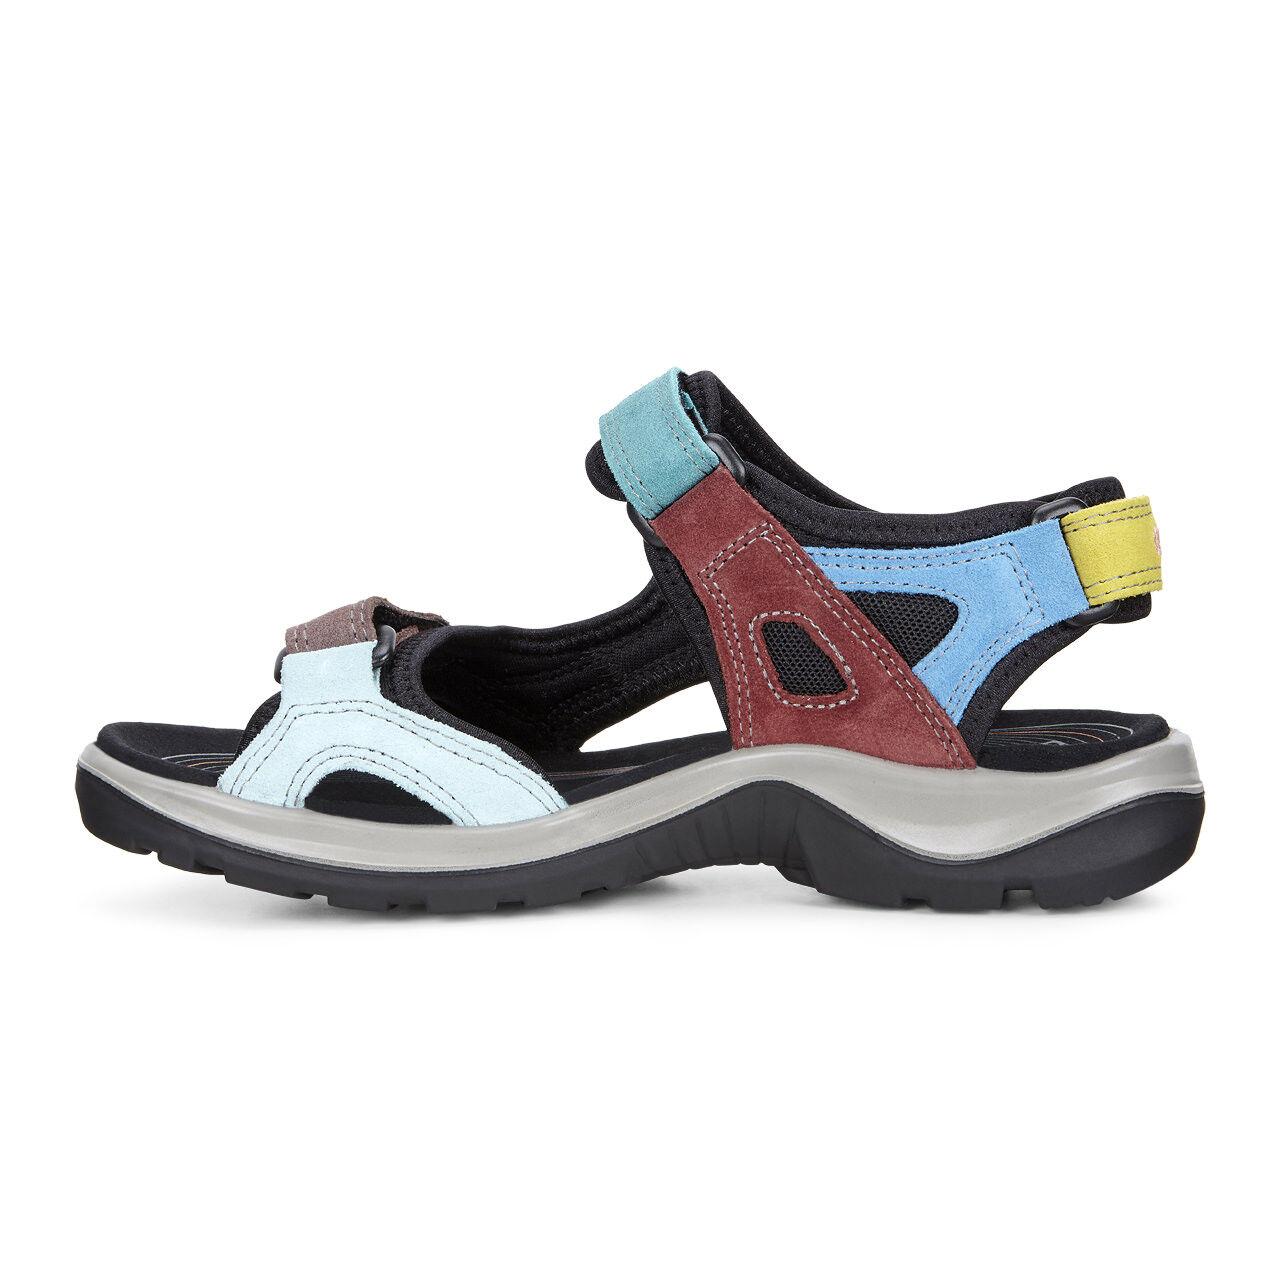 ECCO Anniversary Sandal | Sport | Outdoor Sandals | ECCO® Shoes